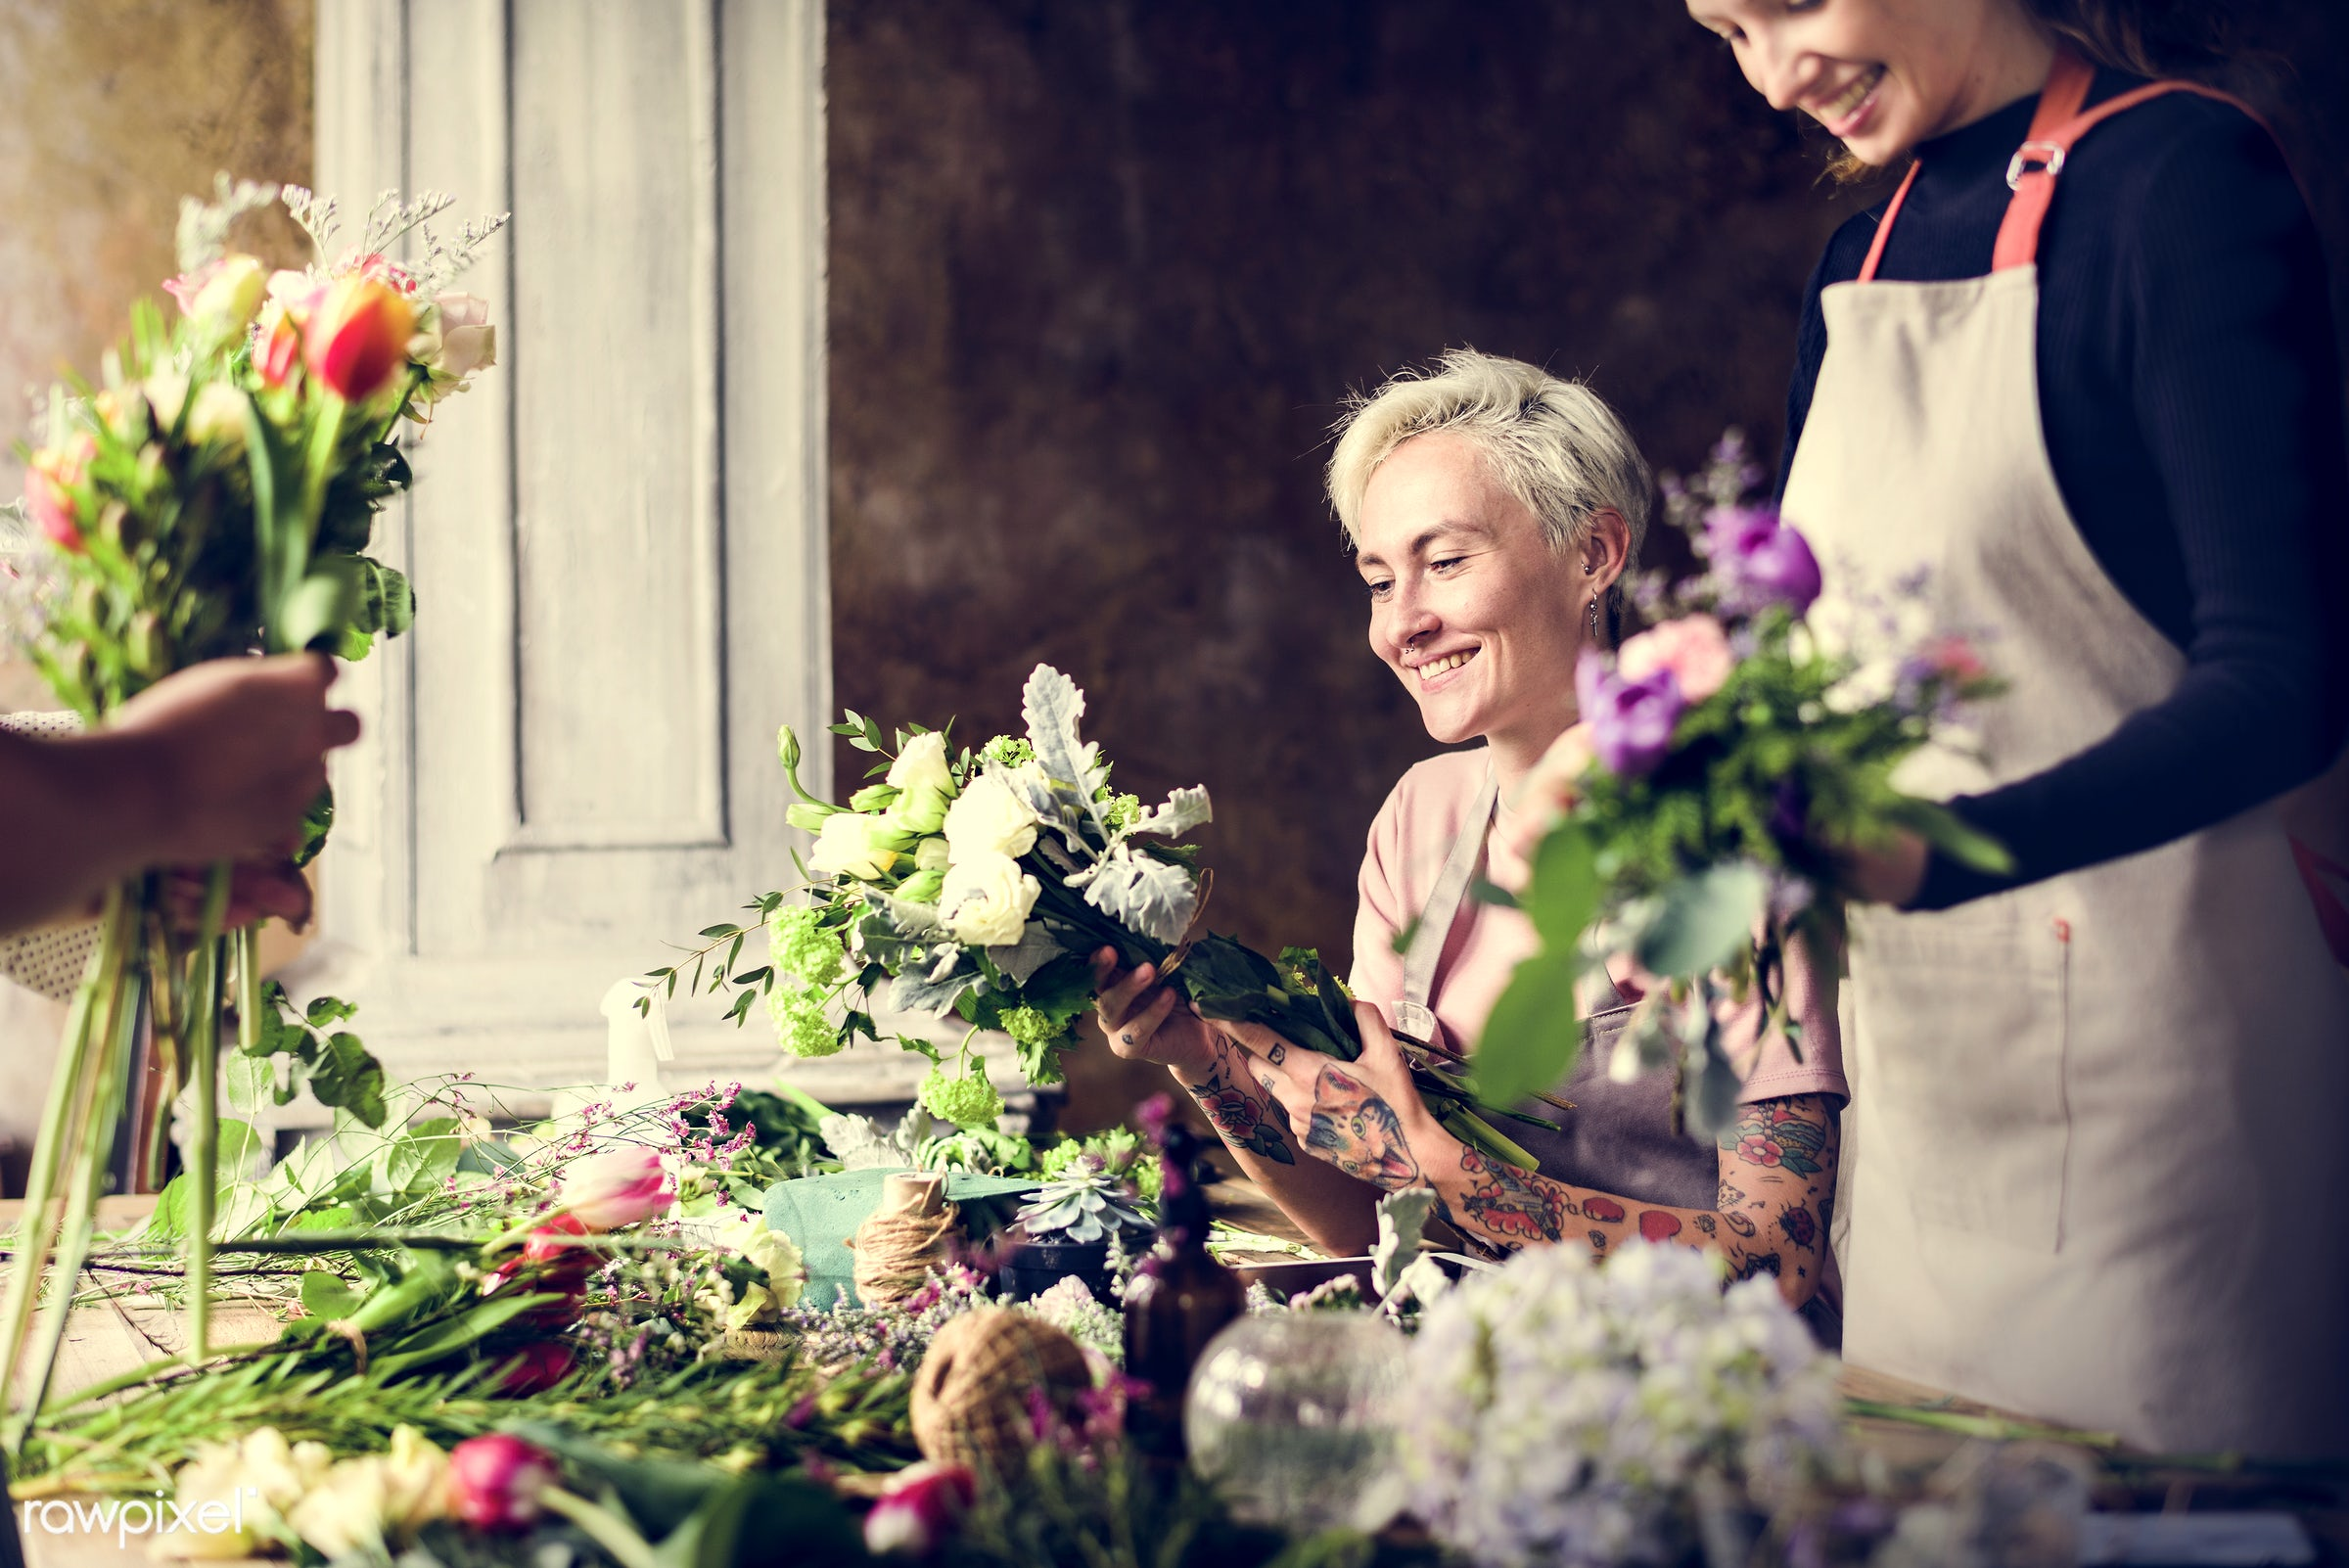 shop, bouquet, detail, person, merchandise, people, decor, nature, flowers, work, hold, refreshment, career, florist,...